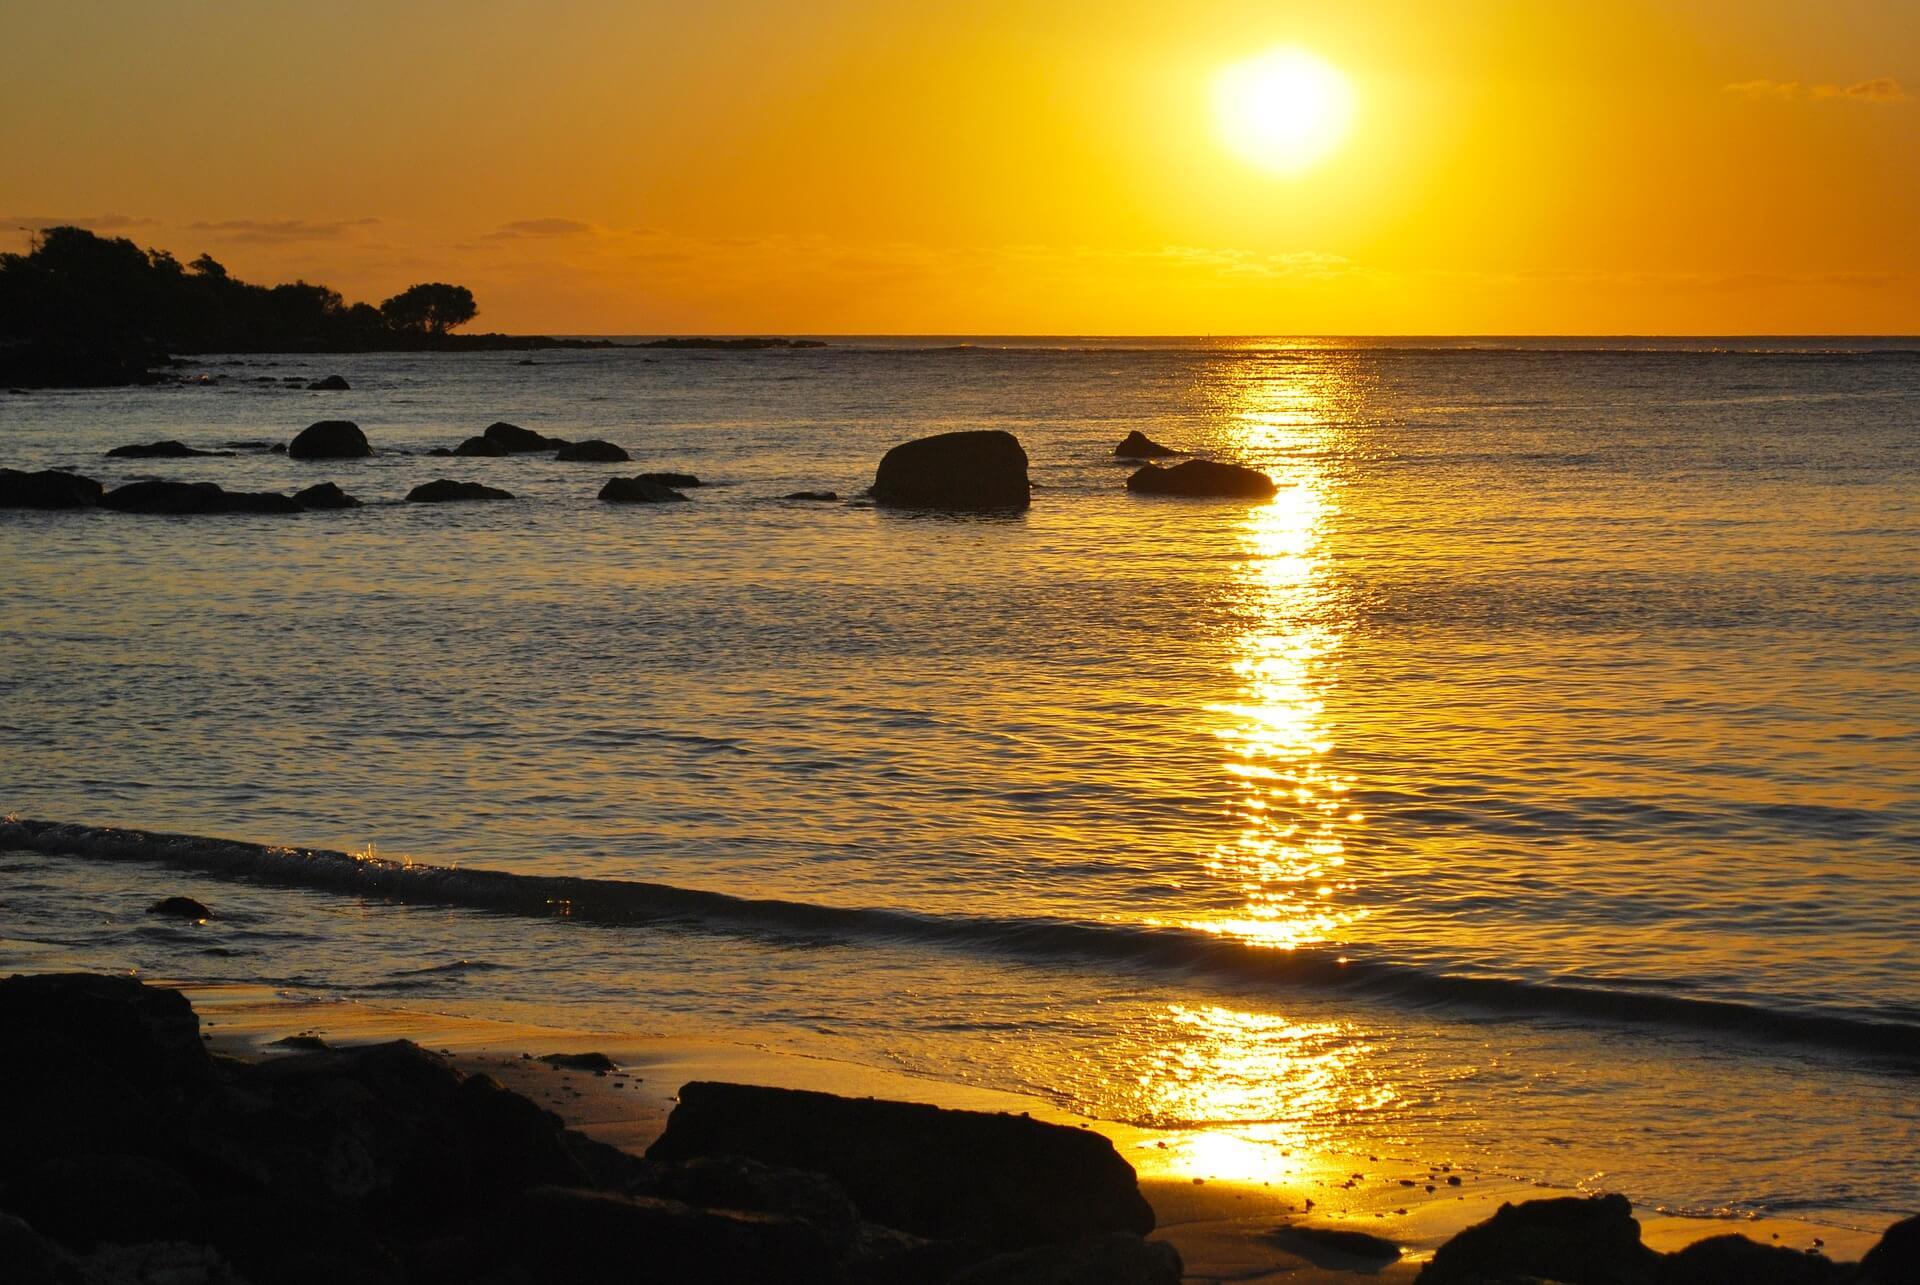 sunset-1616496_1920